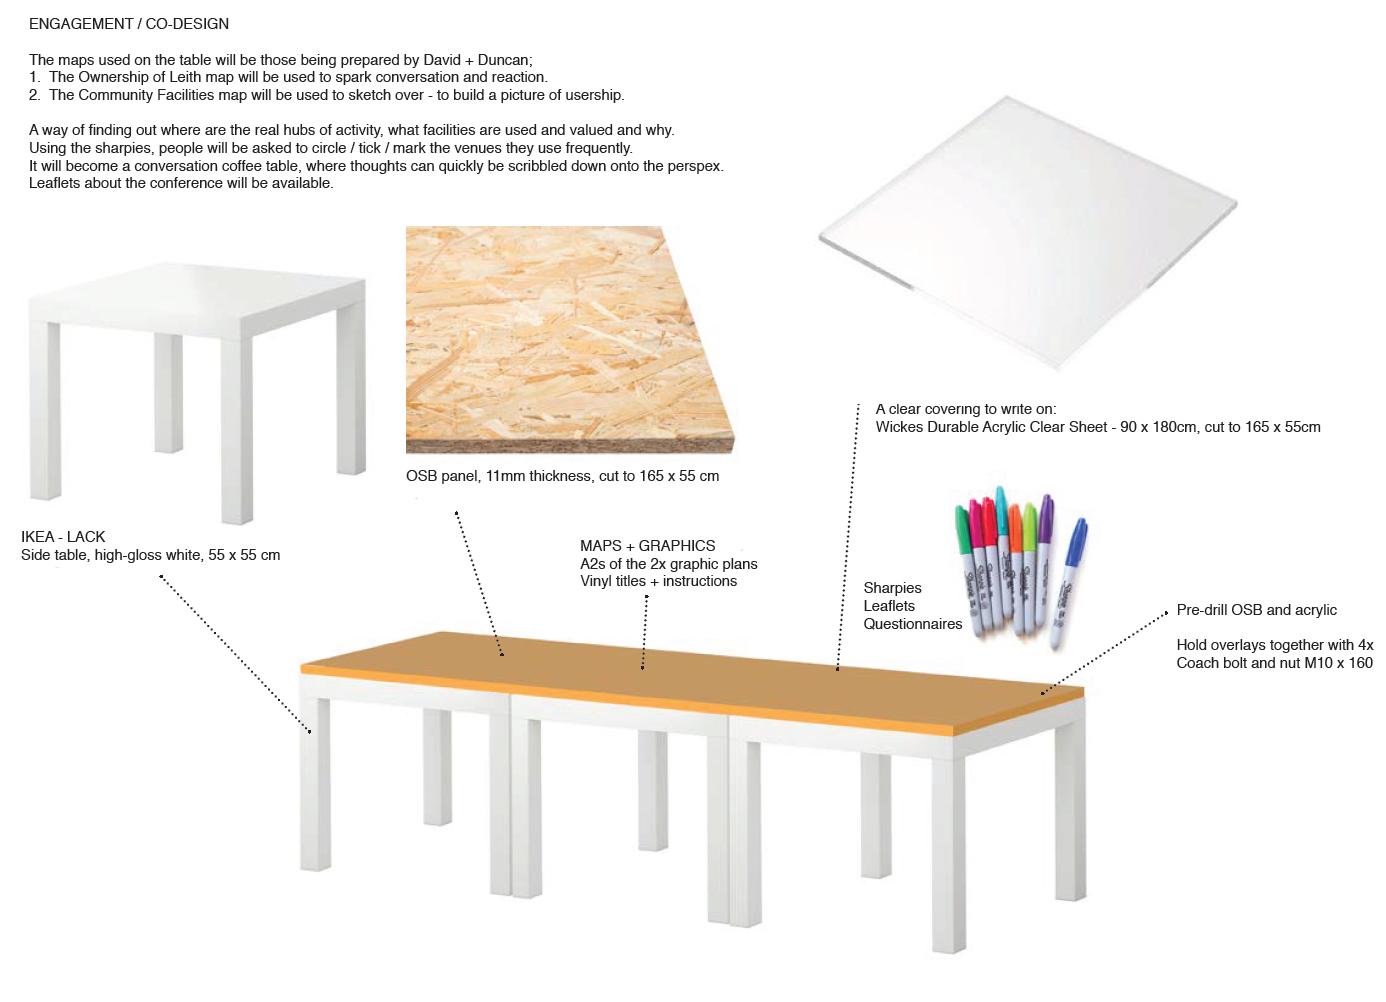 Making Places_diagram_conversation tables.jpg